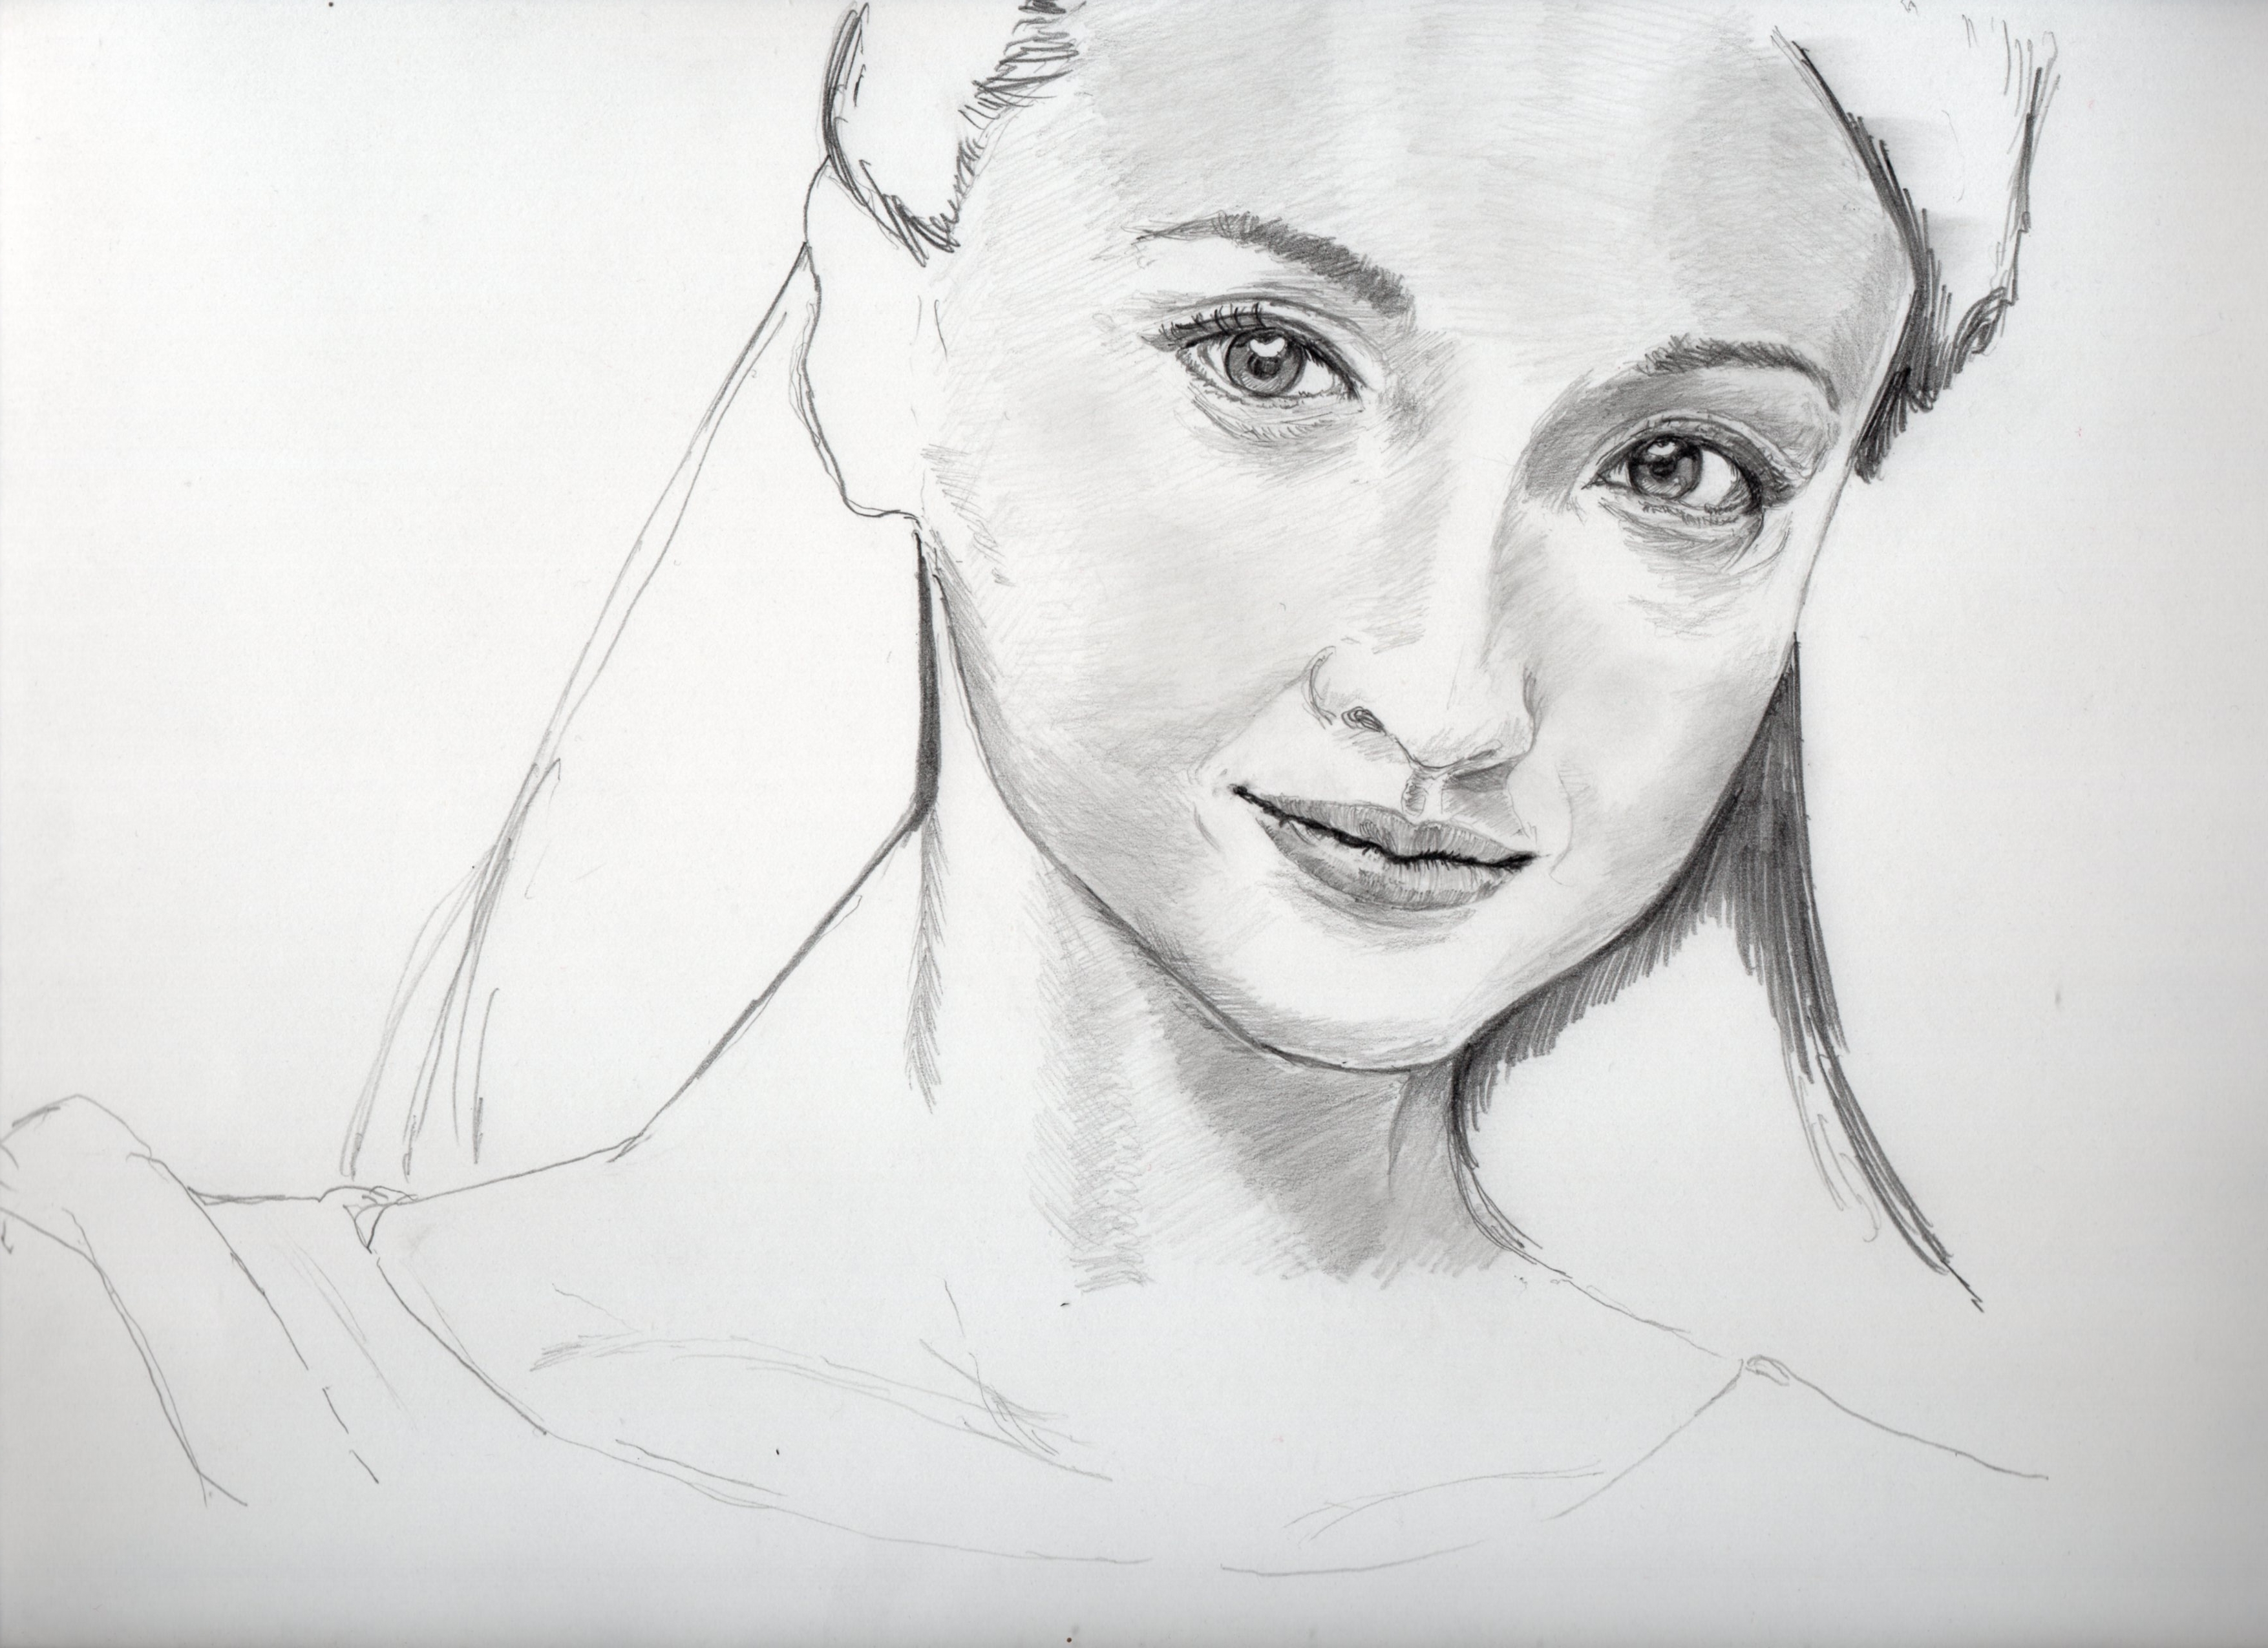 沢尻エリカ鉛筆画似顔絵途中経過